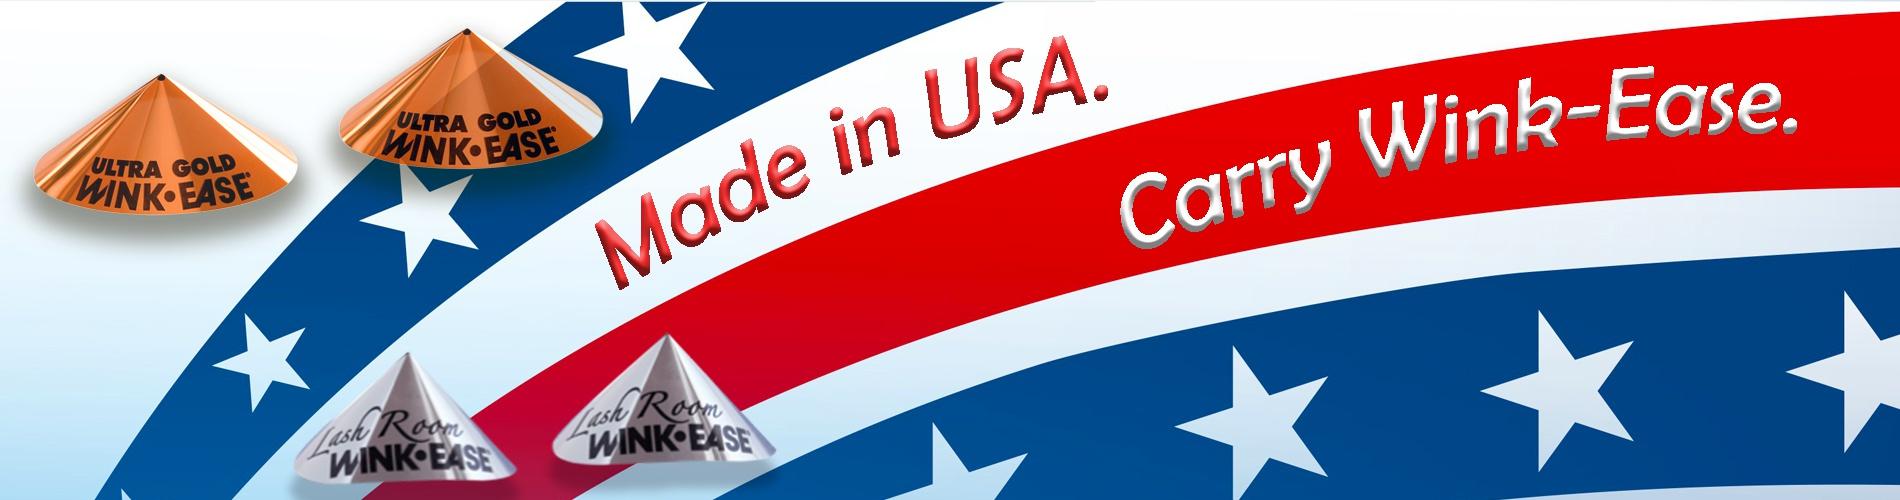 2020 06 27 Heartland 1900x500 Flag Made In Usa